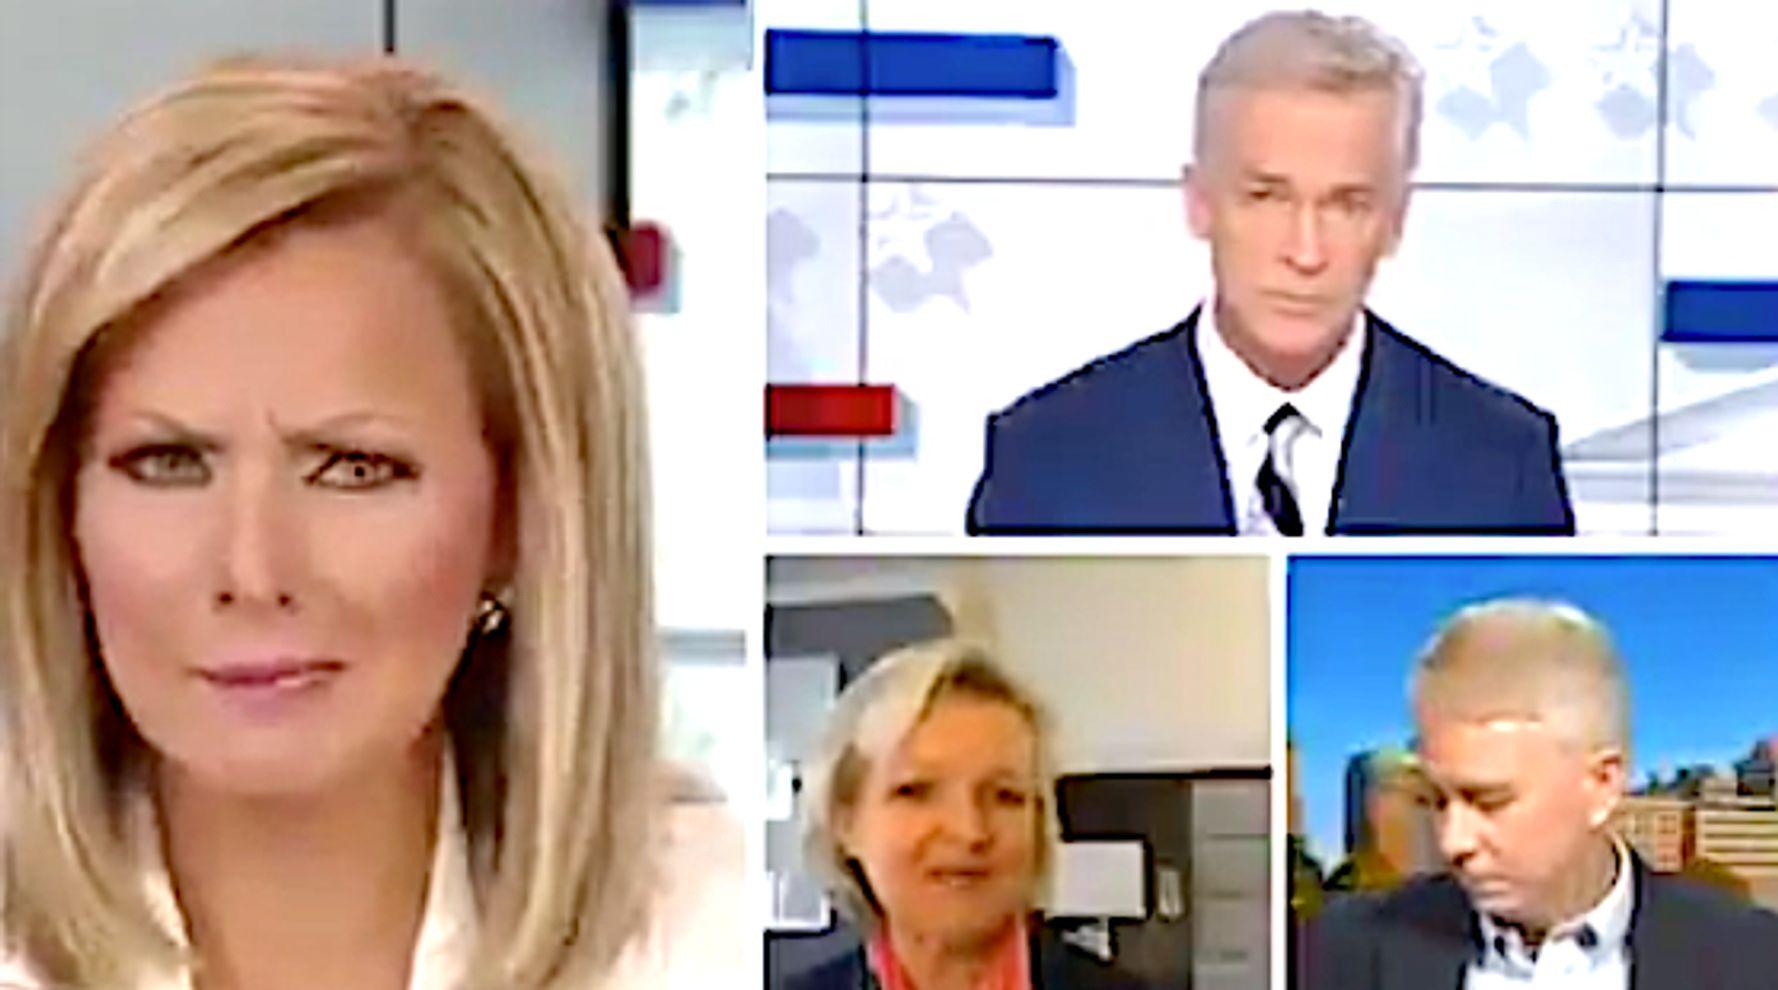 Watch Fox News Host's Look Of Utter Disdain Over Voter Fraud Claim On Hot Mic